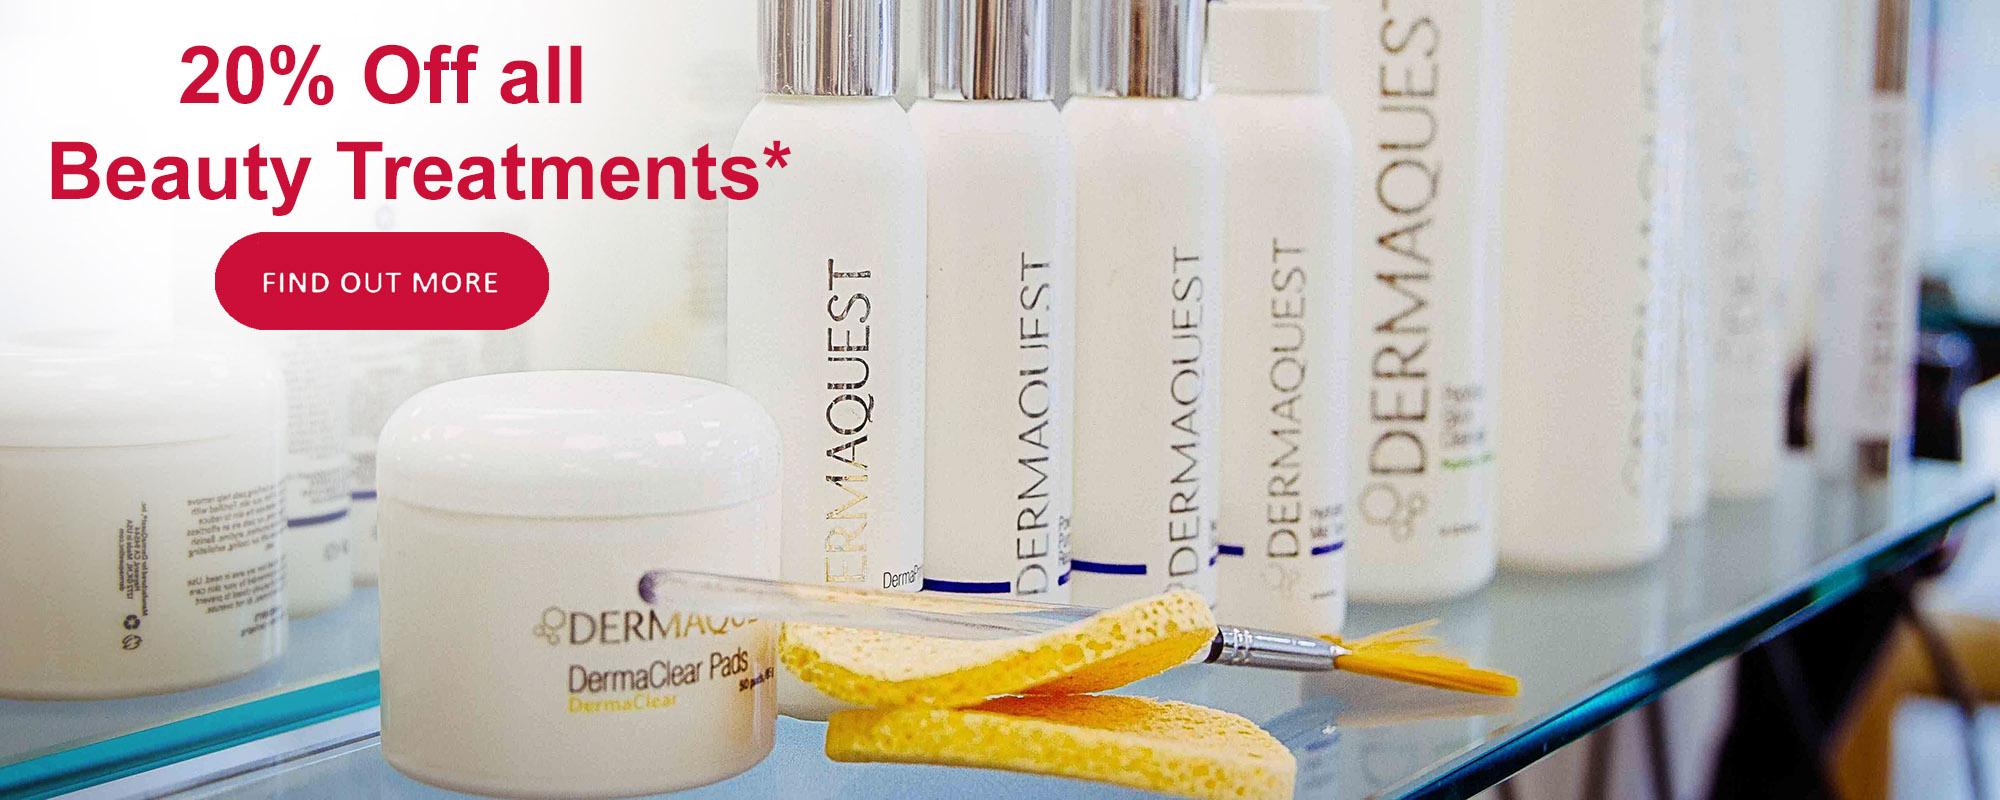 Unique Hair products